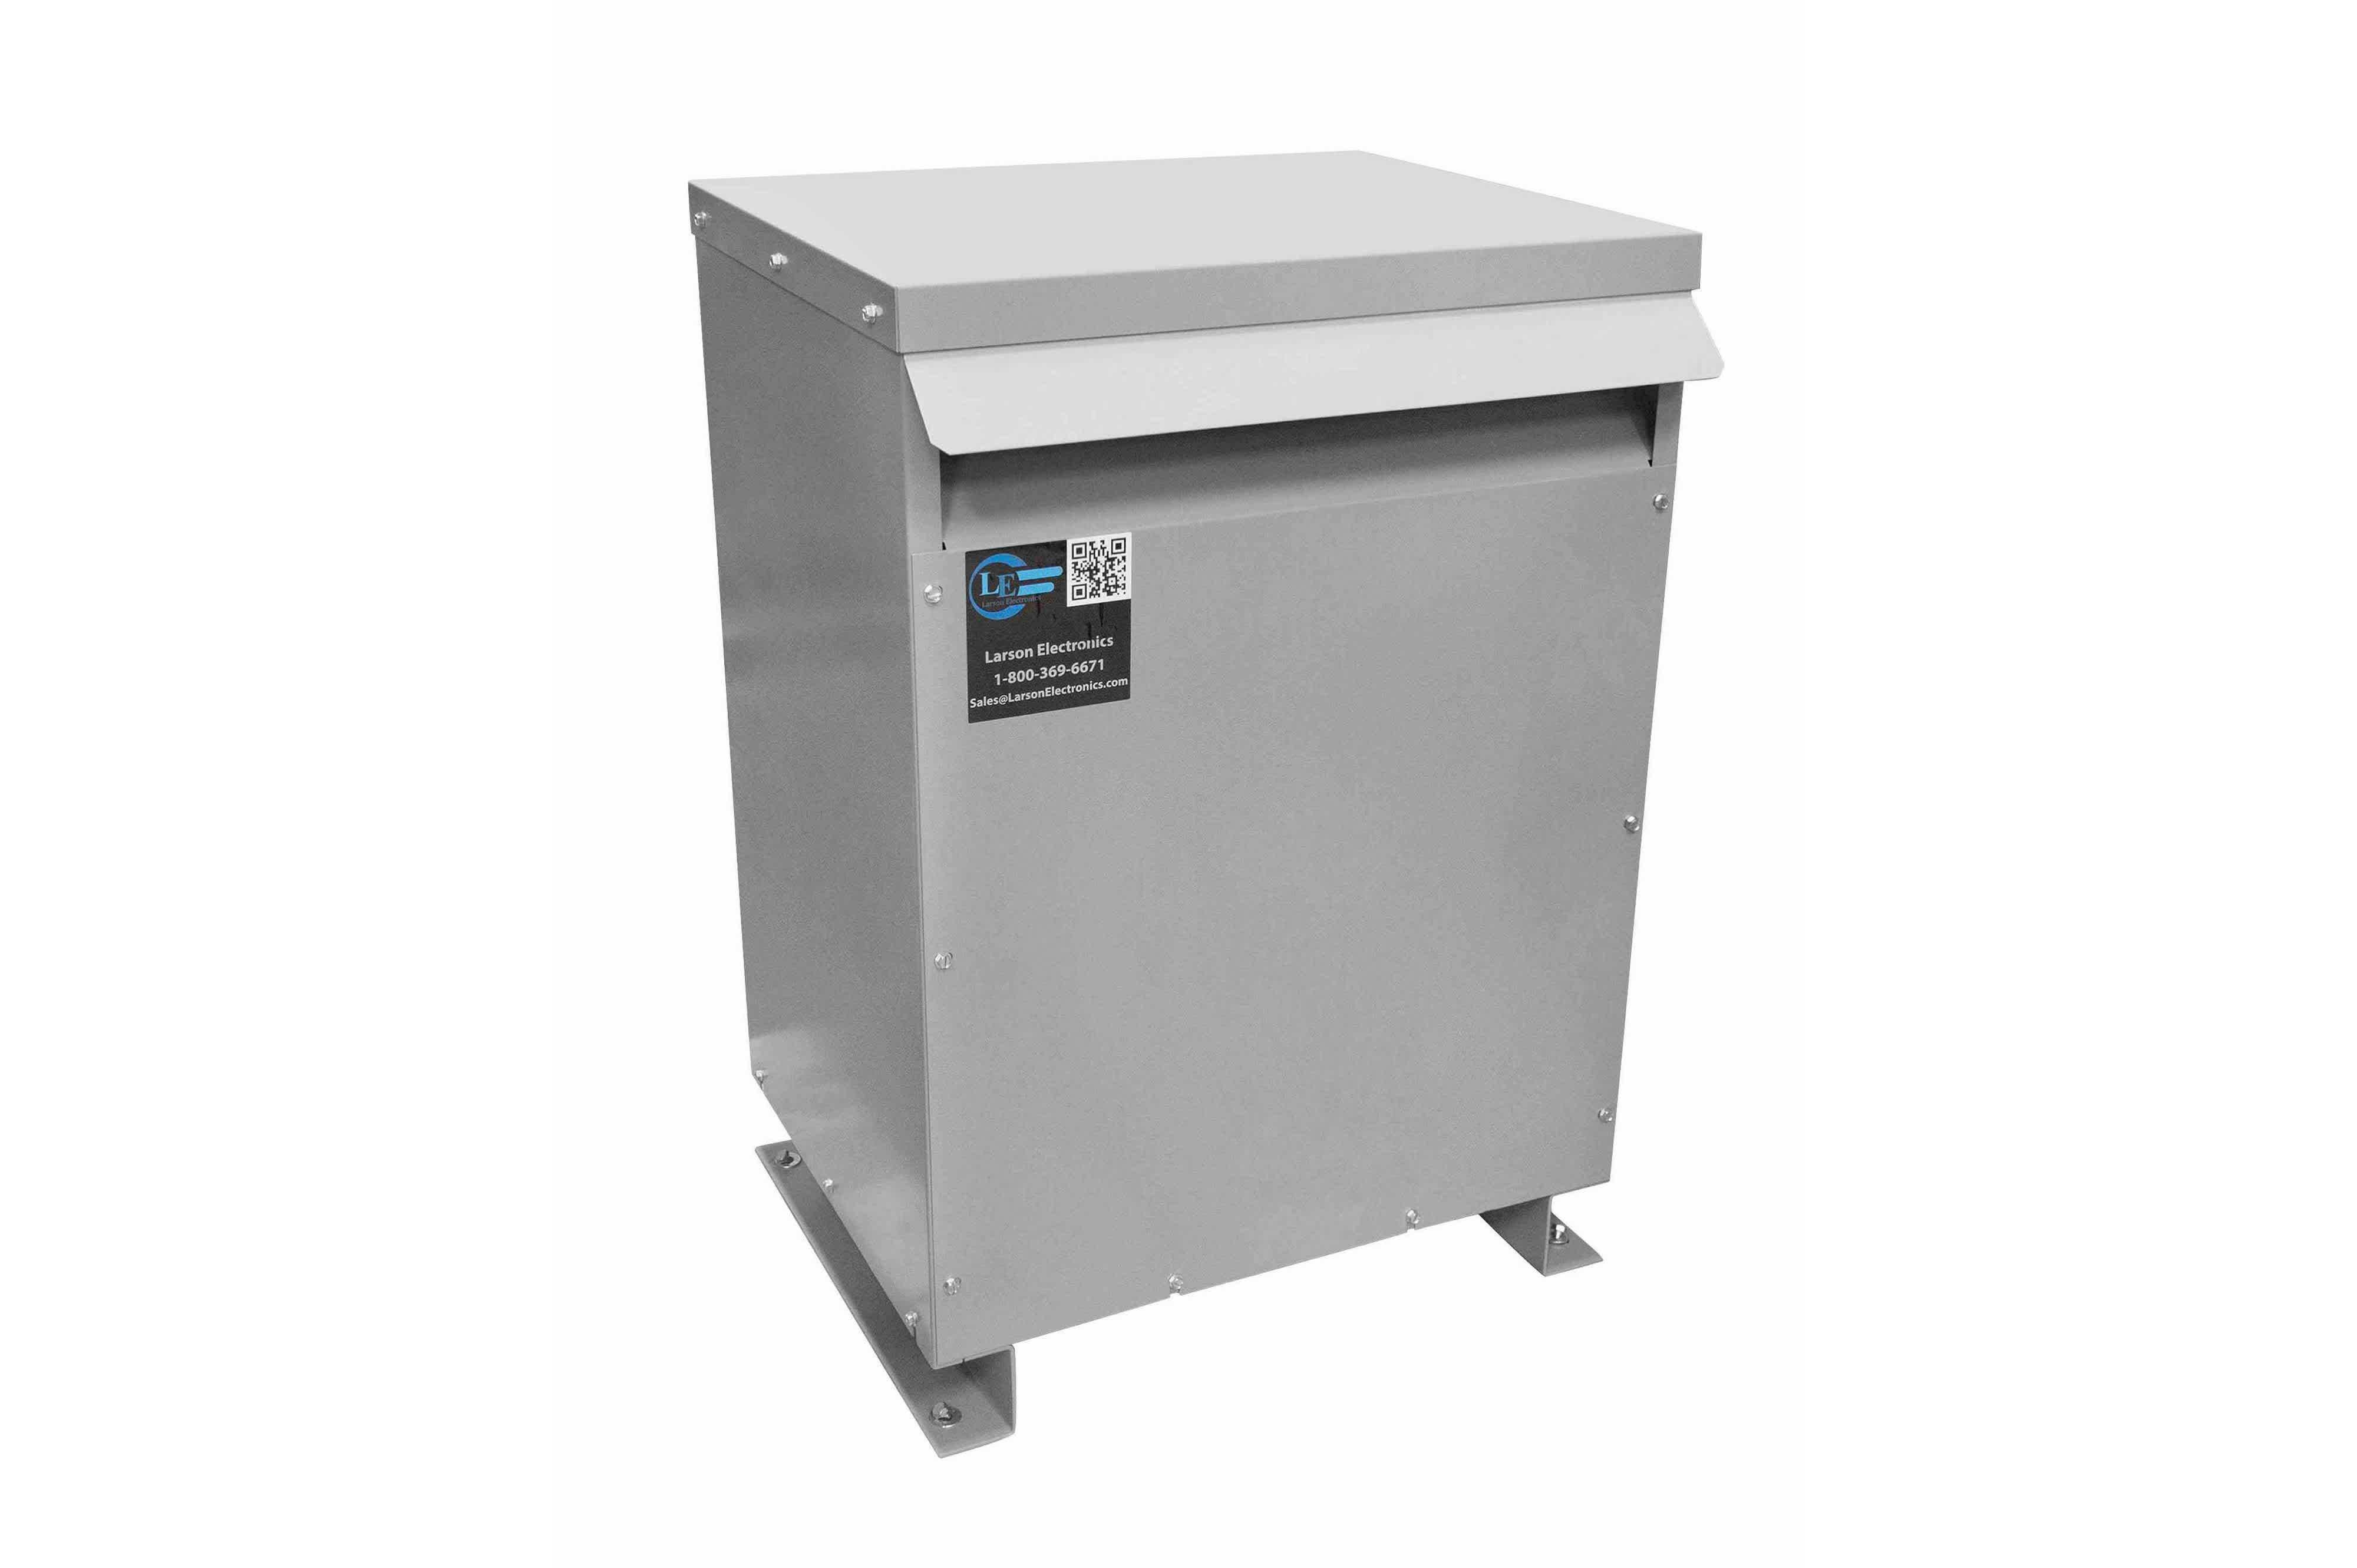 700 kVA 3PH Isolation Transformer, 600V Wye Primary, 480V Delta Secondary, N3R, Ventilated, 60 Hz